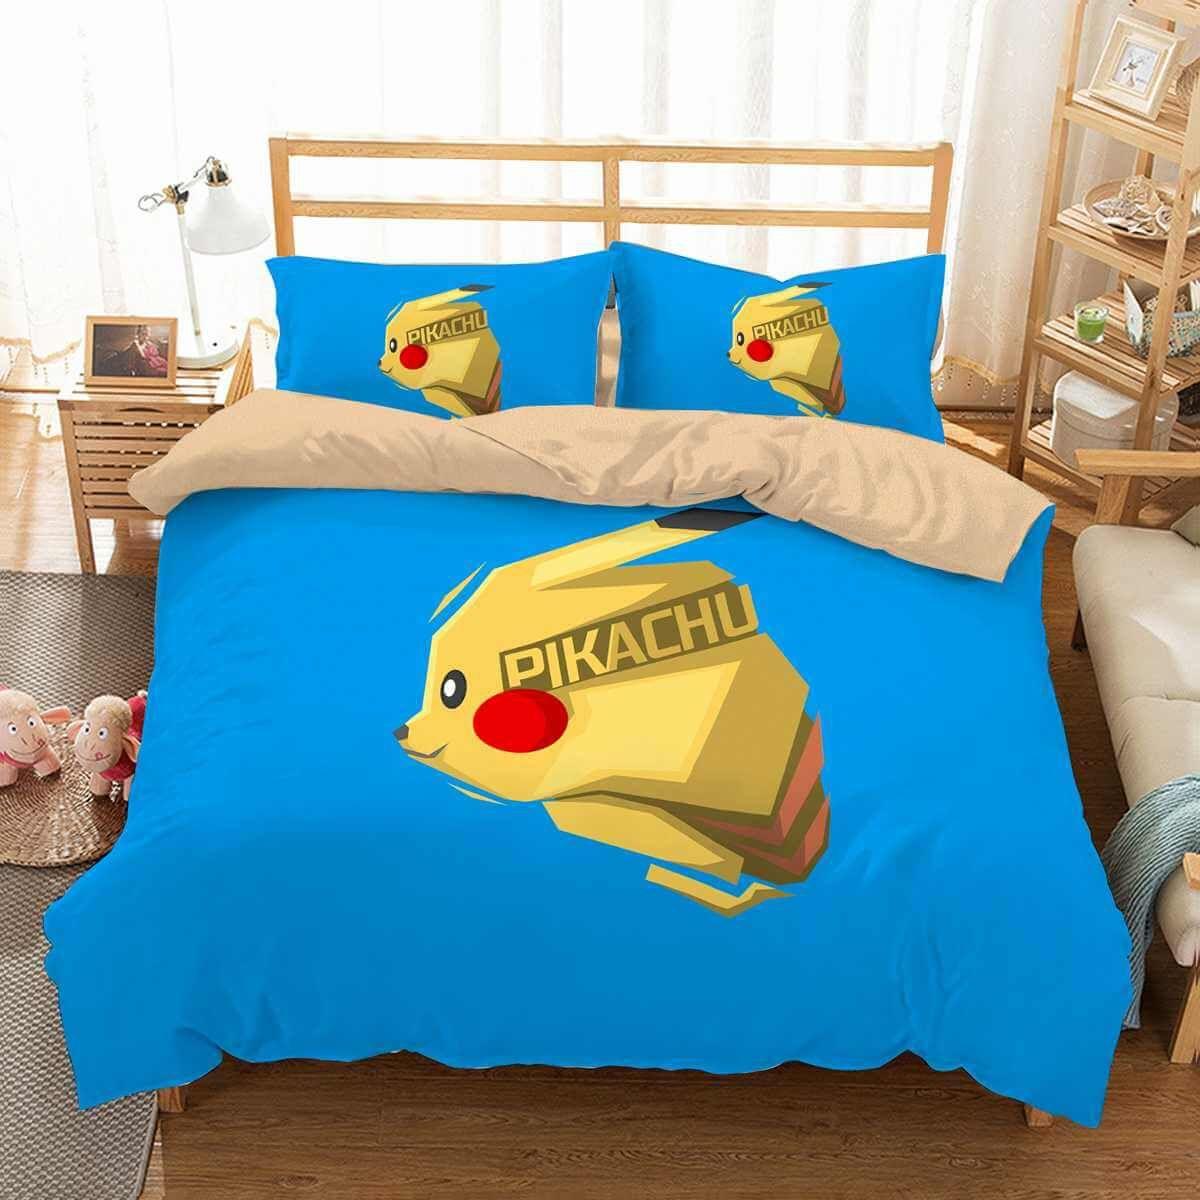 3d Customize Pikachu Bedding Set Duvet Cover Set Bedroom Set